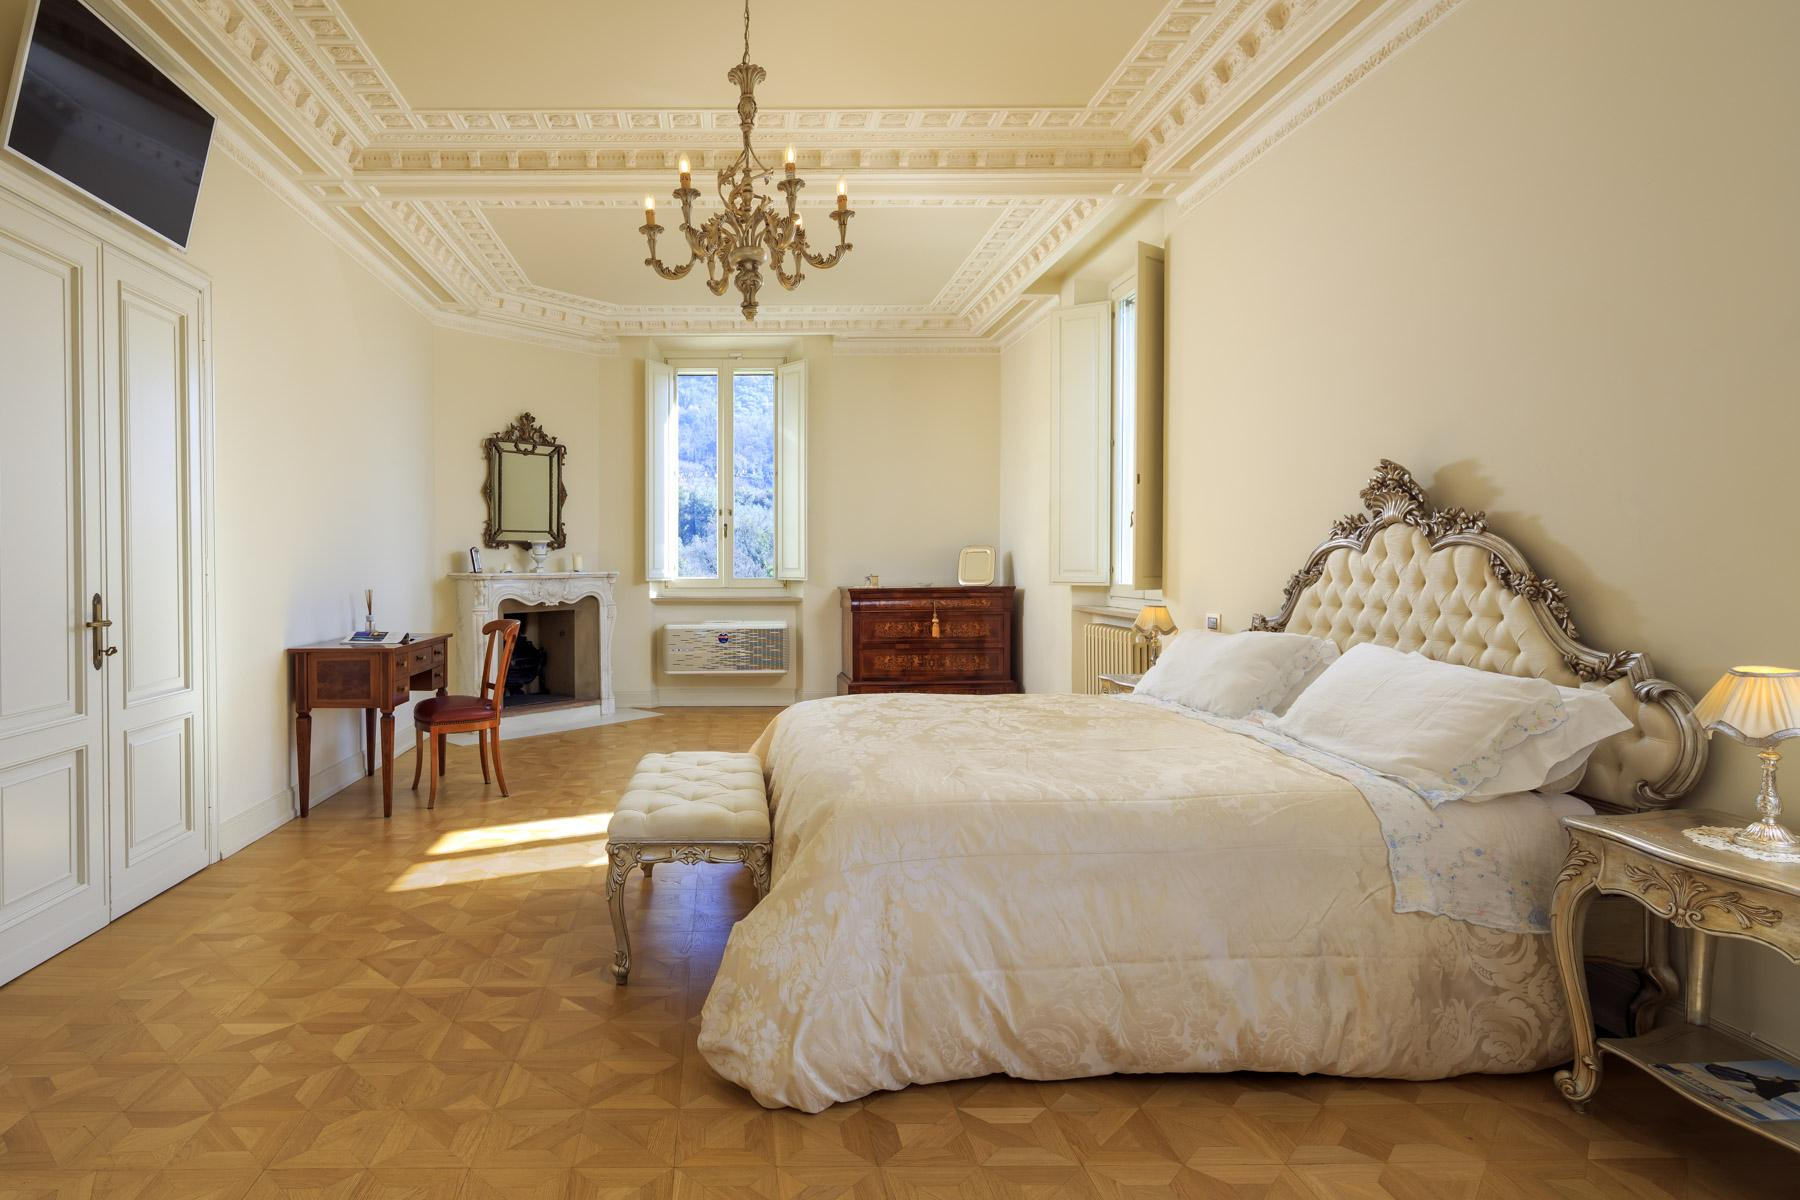 Montecatini Terme小镇优雅的新艺术风格的别墅 - 9